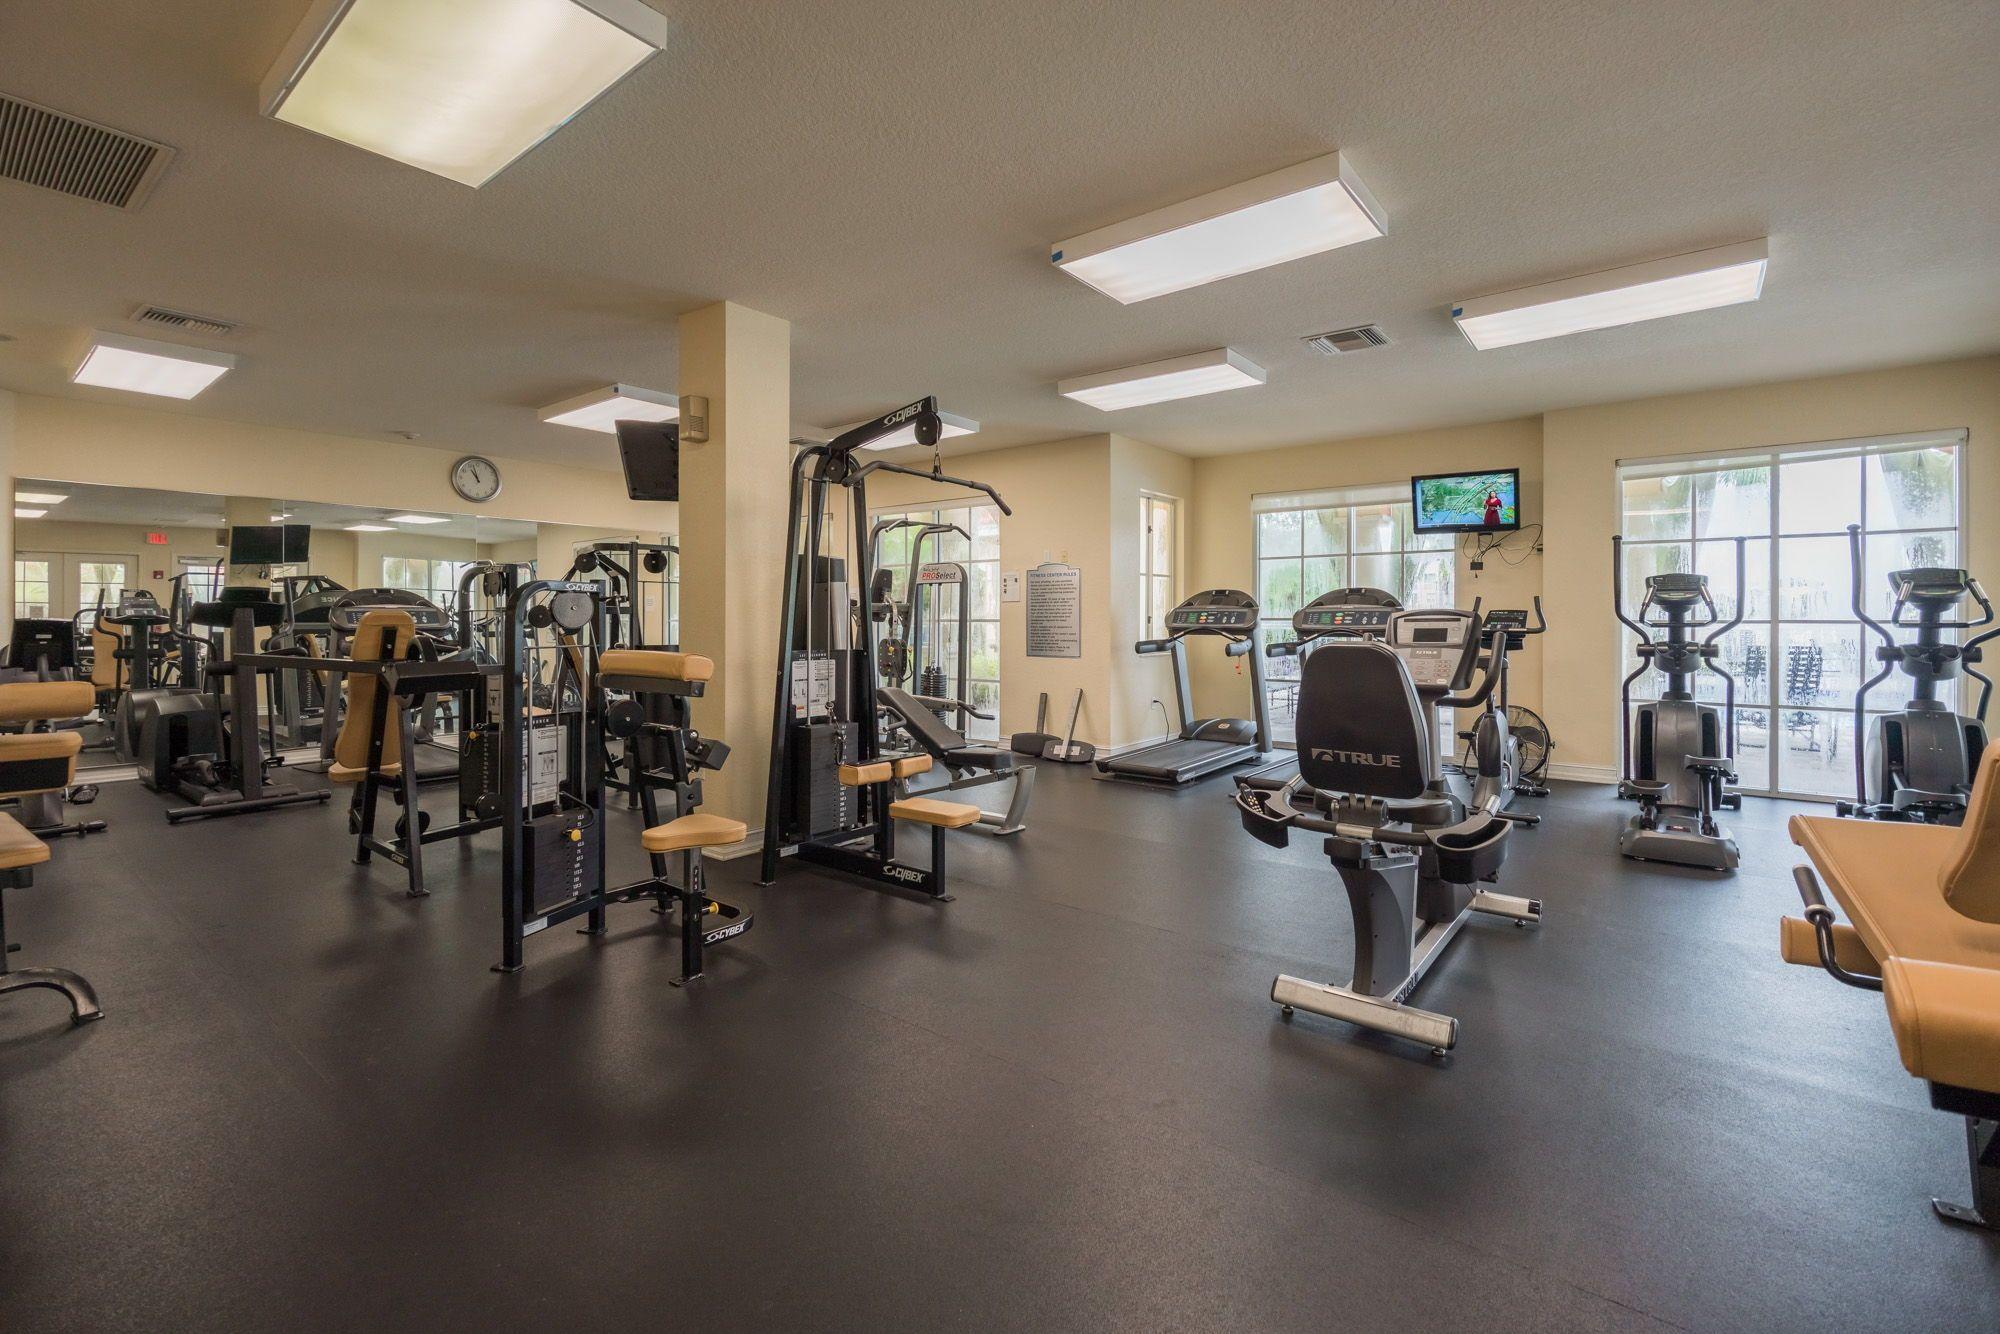 4eb3819b74492c7ce1b3ca6abc0a2ec2 - Crunch Fitness Palm Beach Gardens Fl